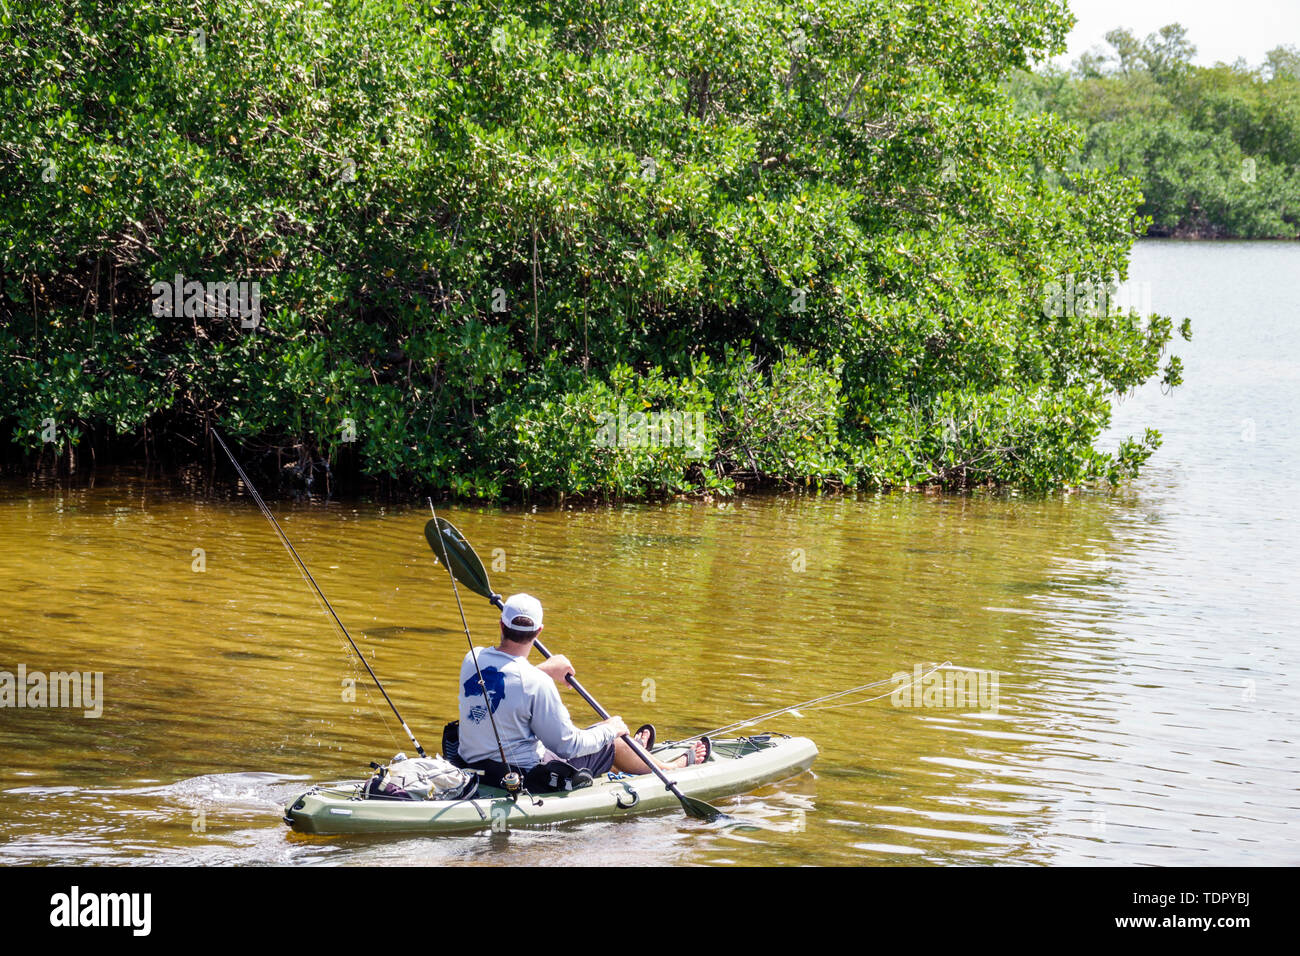 Sanibel Island Florida J.N. Ding Darling National Wildlife Refuge environmental conservation education Wildlife Drive trail kayak fisherman rowing man mangrove - Stock Image